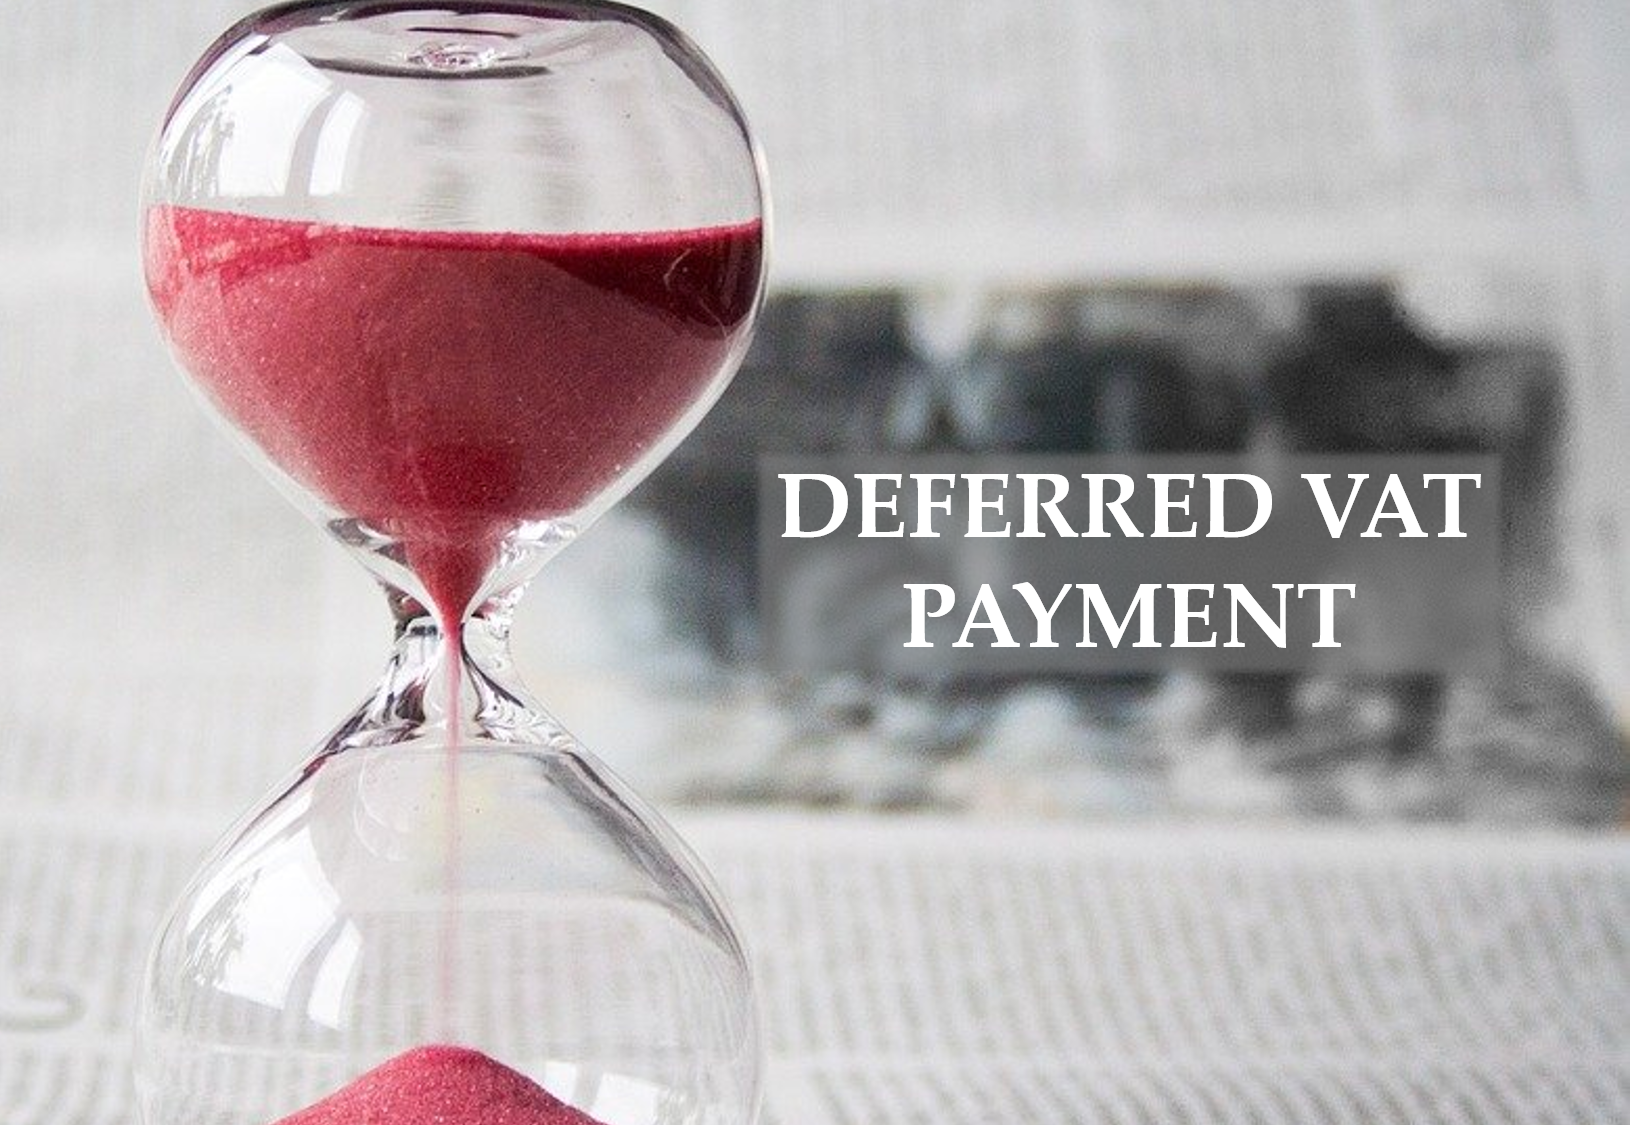 deferred VAT payment